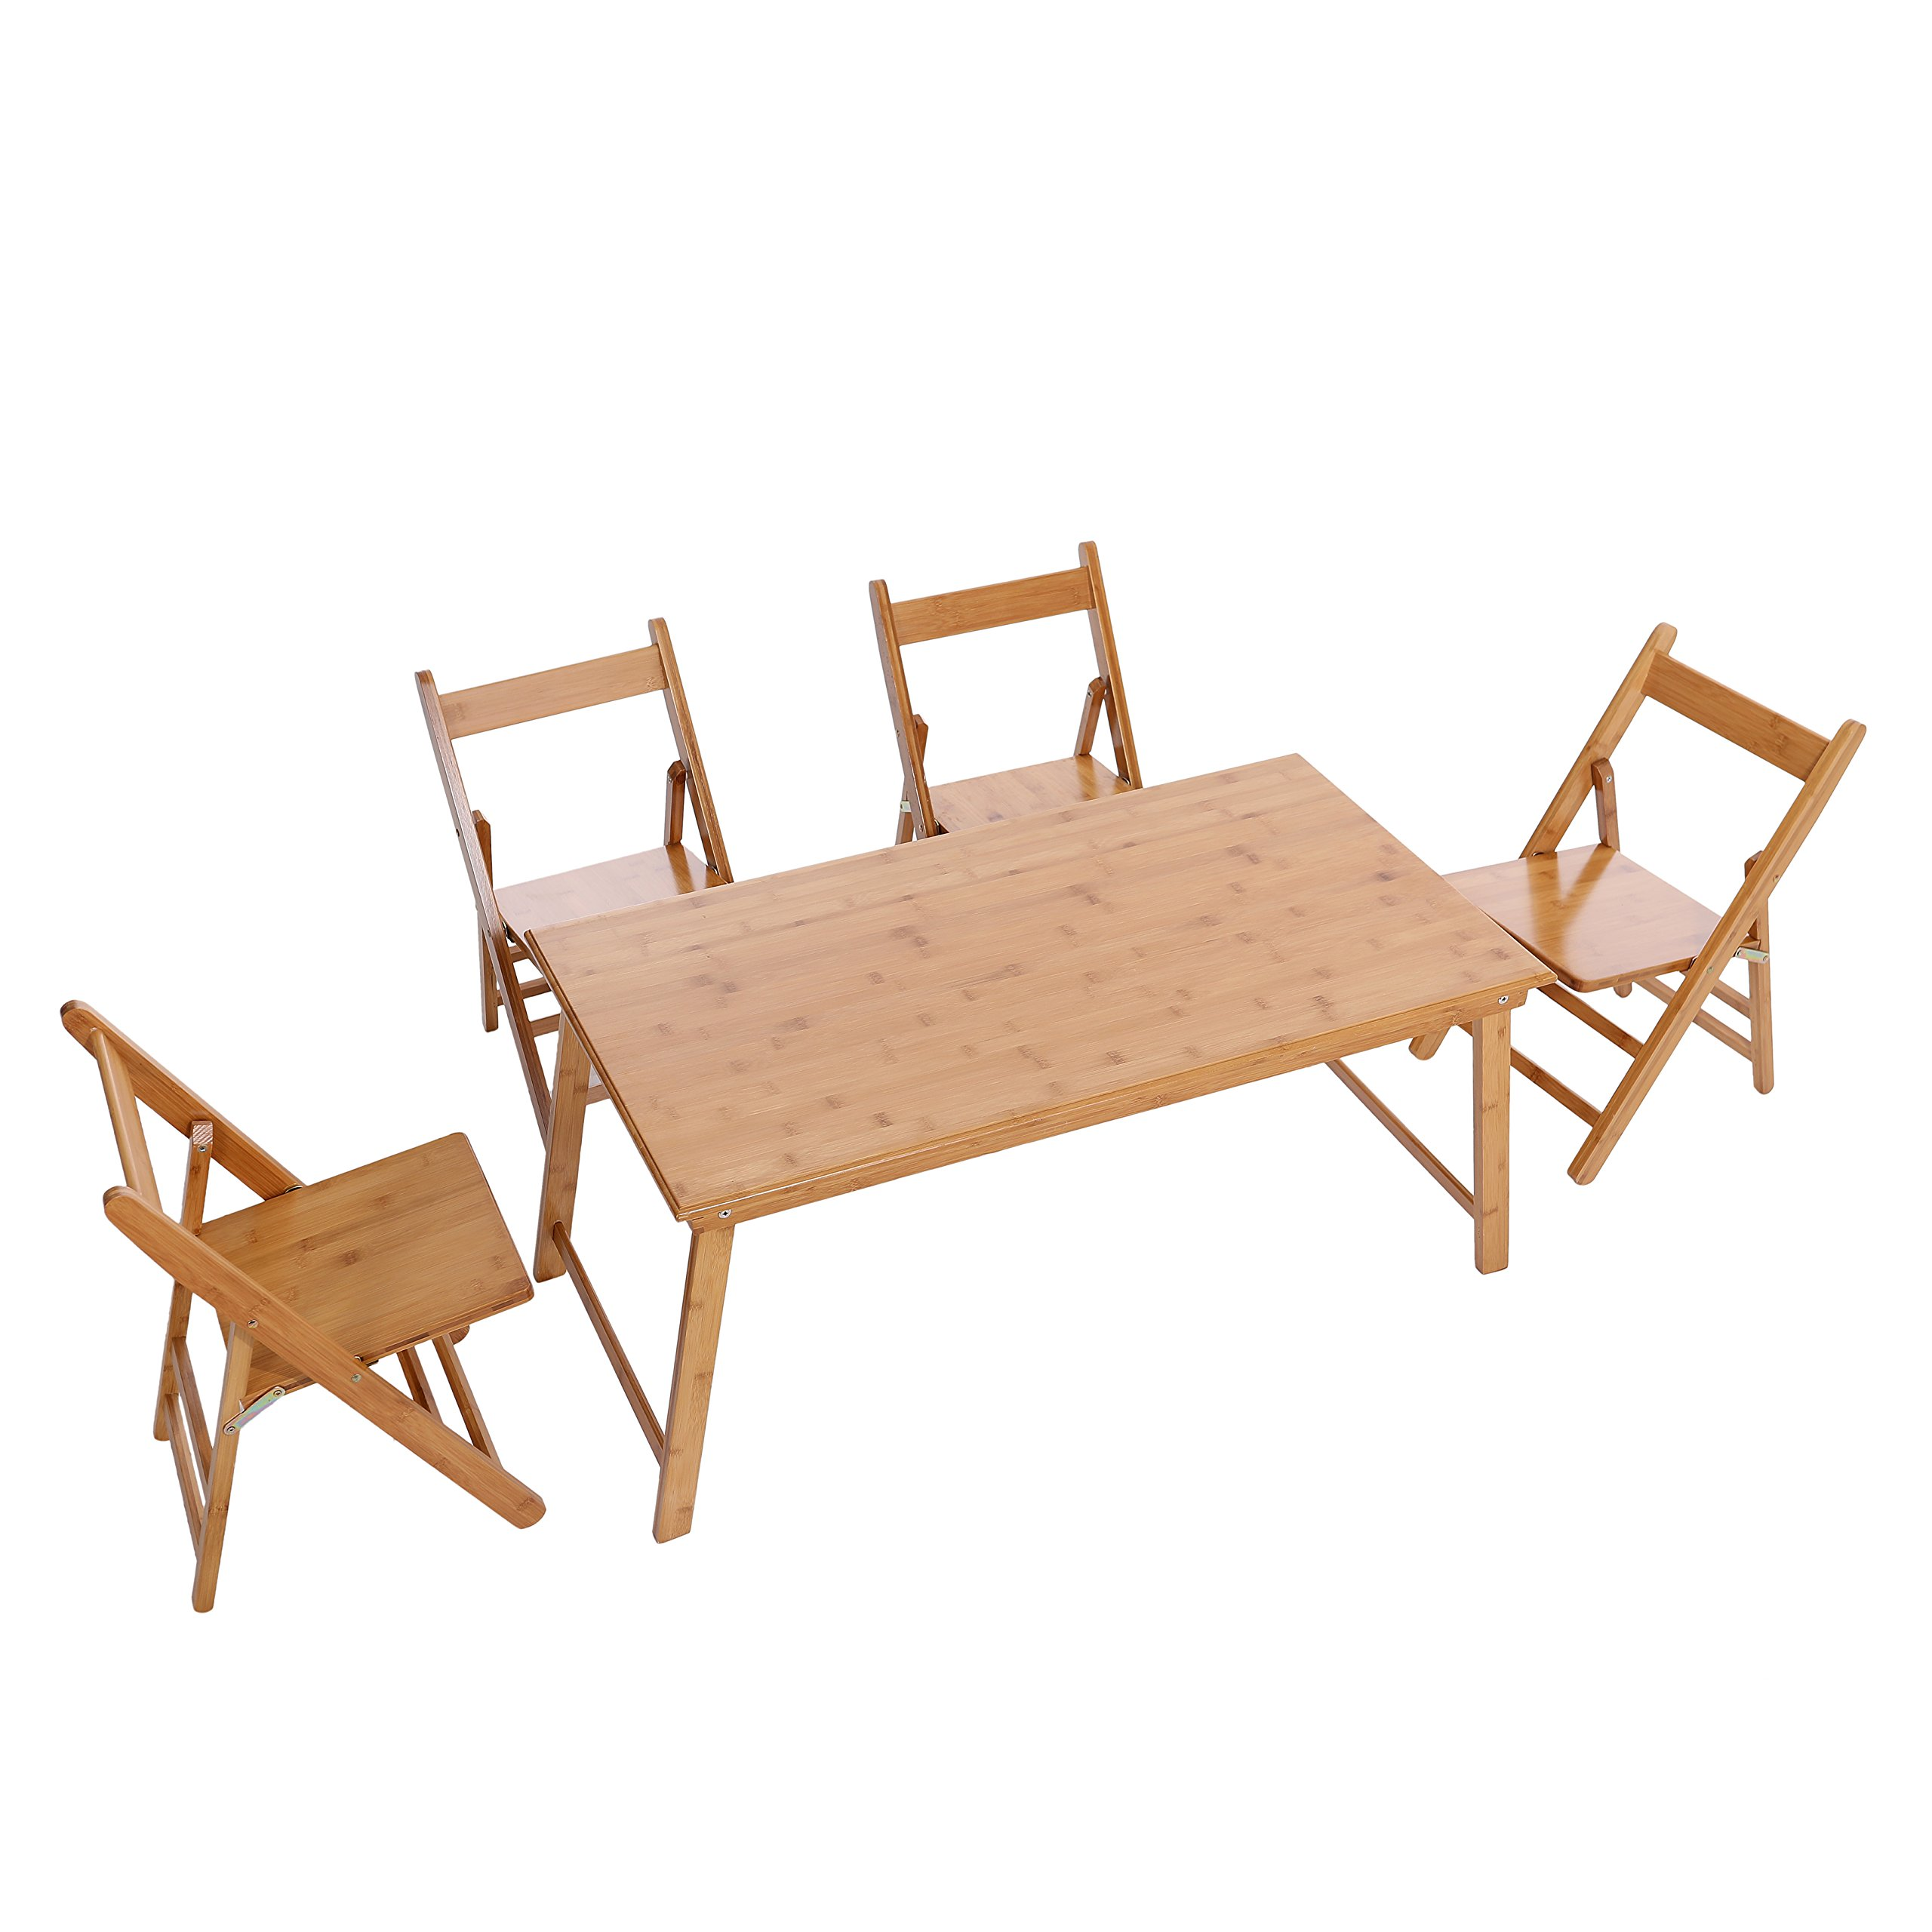 - UNICOO – Bamboo Rectangular Folding Table With 4 Folding Chairs, 5